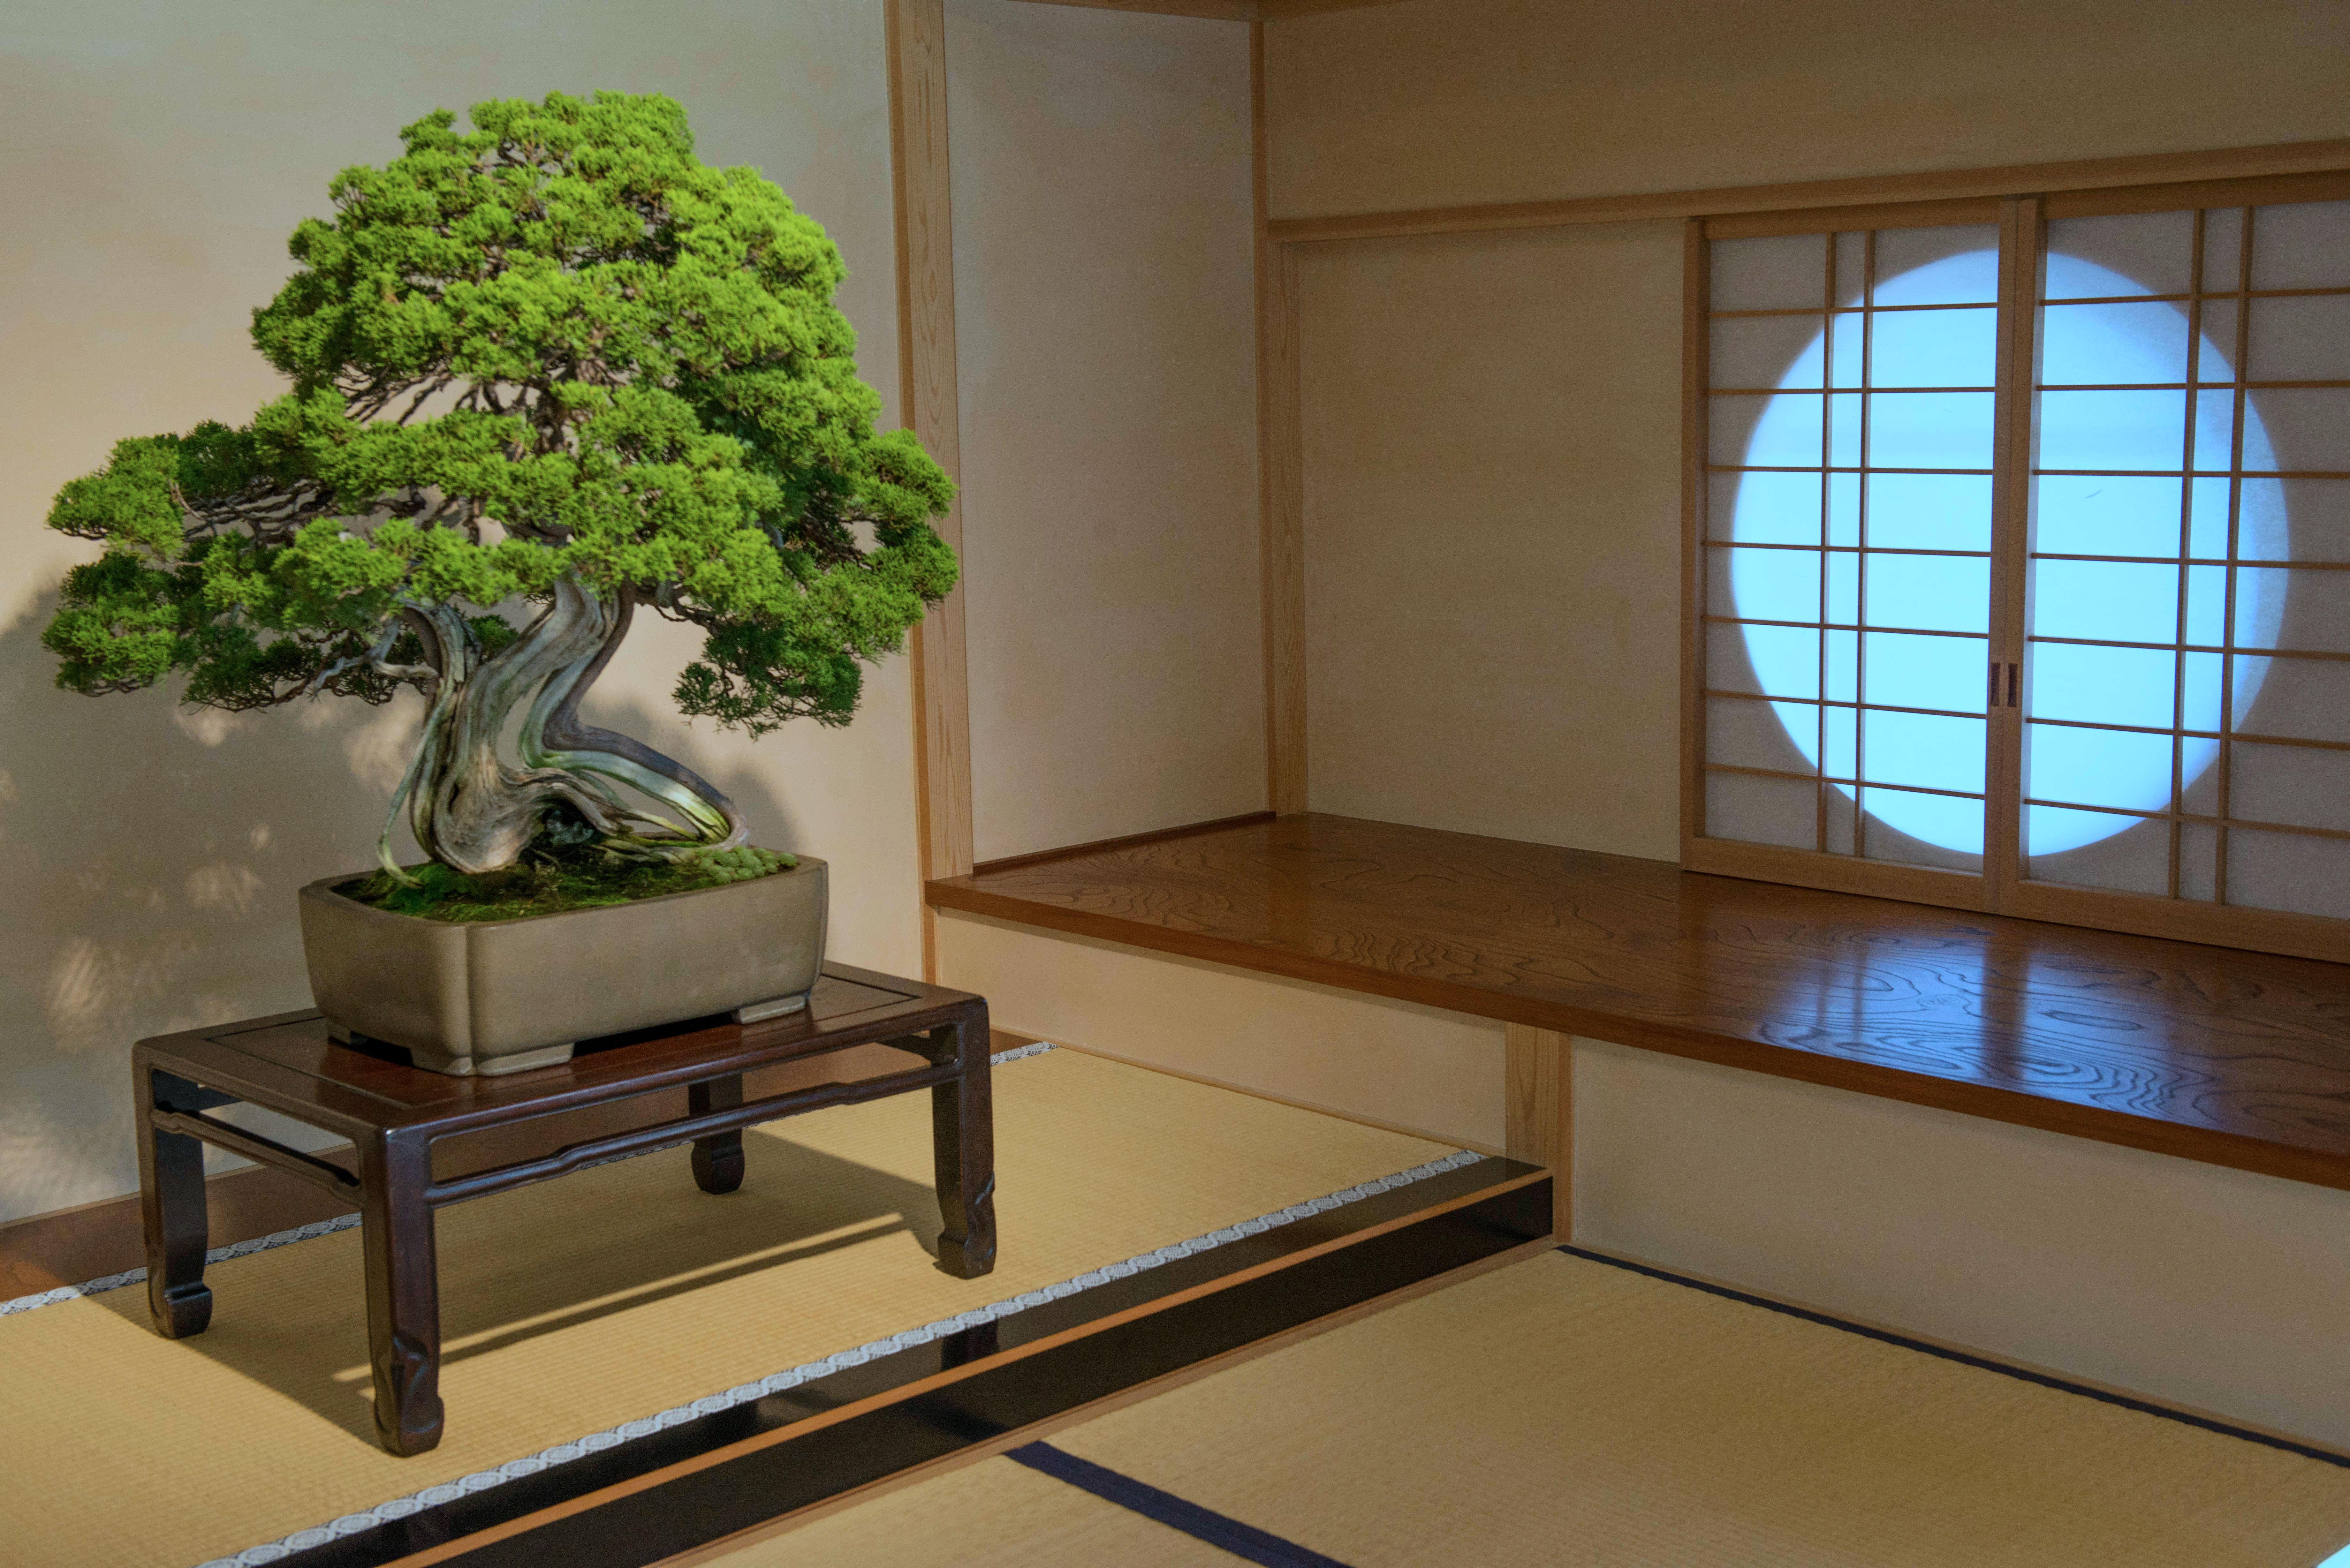 p16-mansfield-bonsai-c-201411021